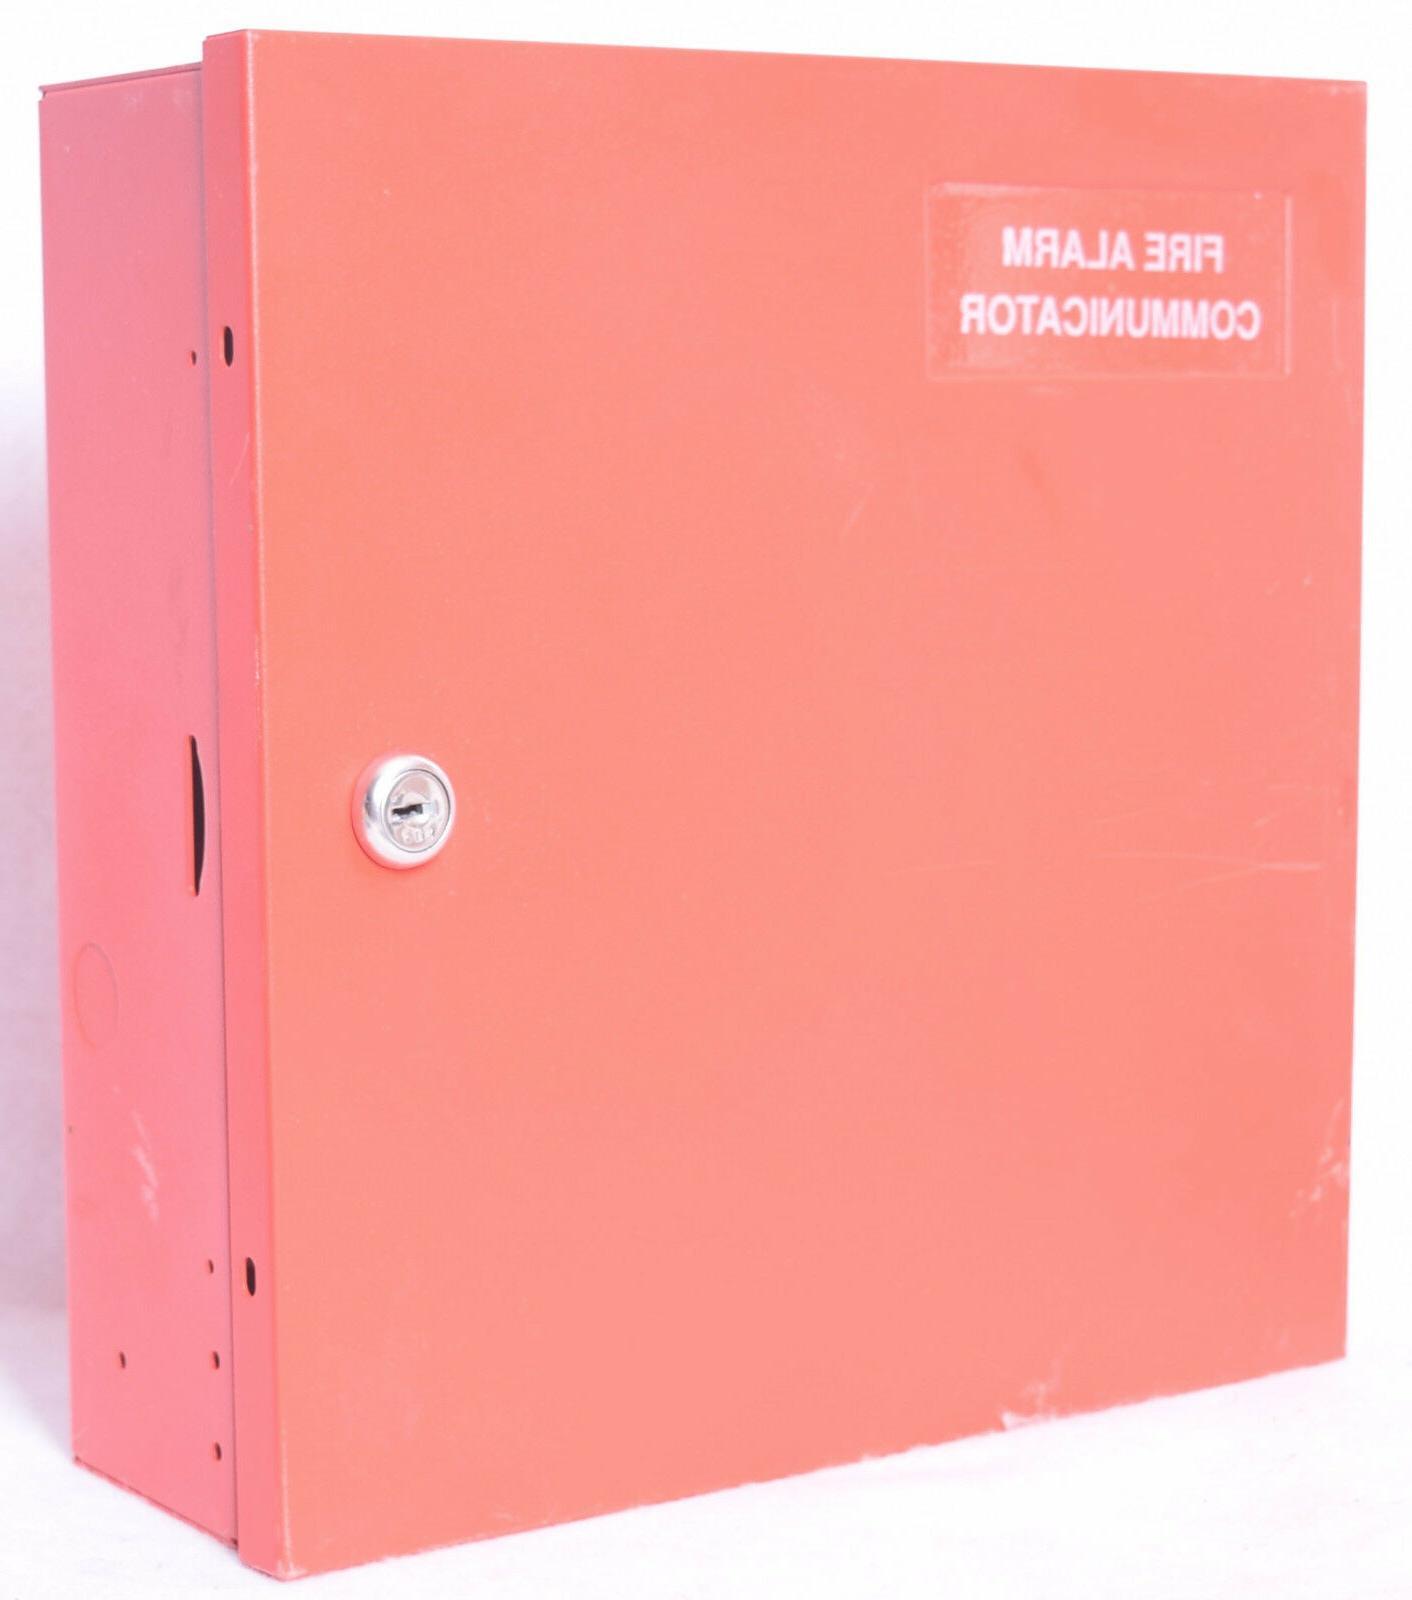 signal system equipment enclosure fire alarm communicator